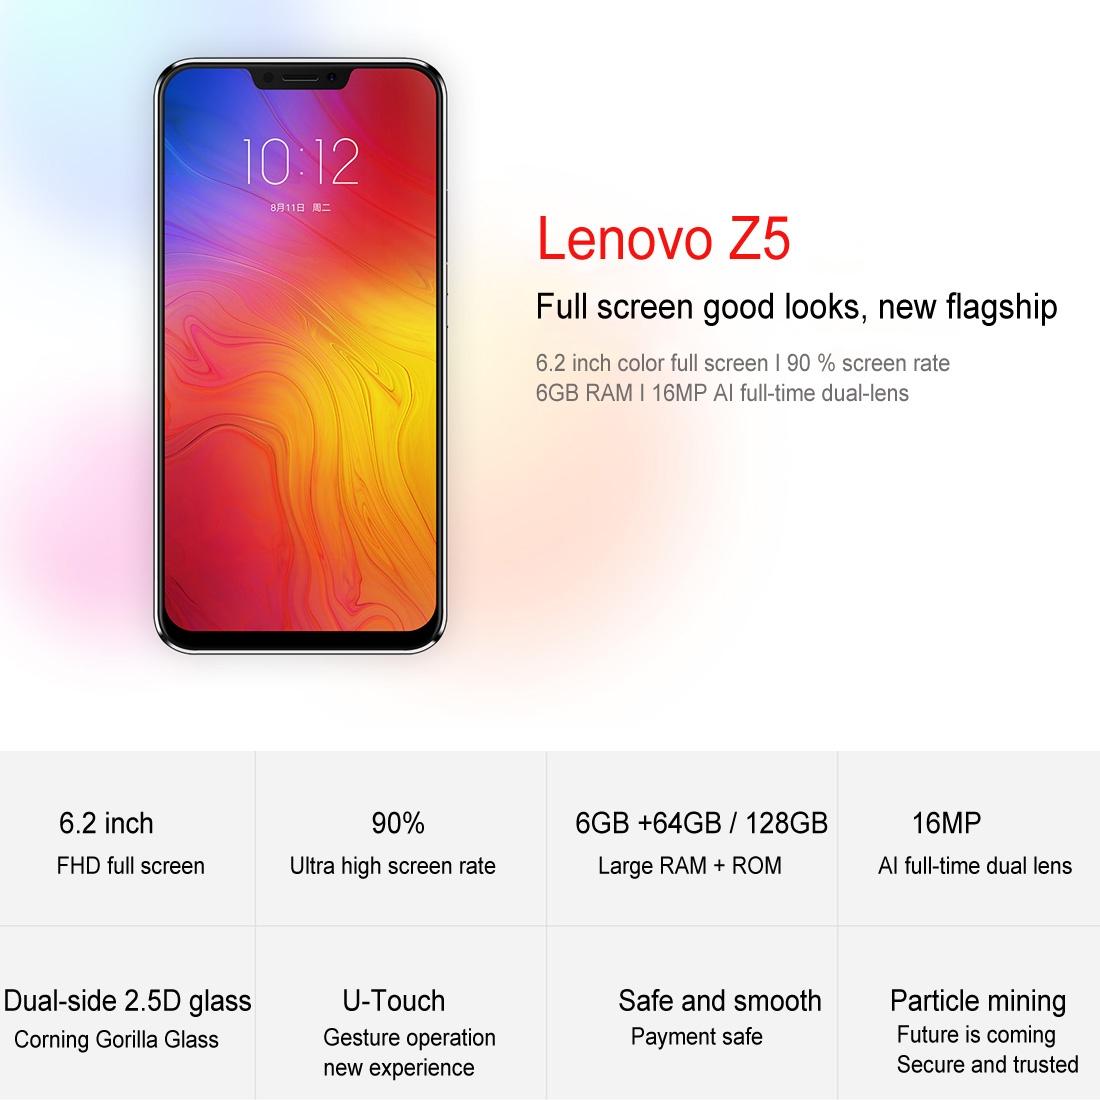 i.ibb.co/MfGCTyd/Smartphone-6-GB-64-GB-Lenovo-Z5-4.jpg